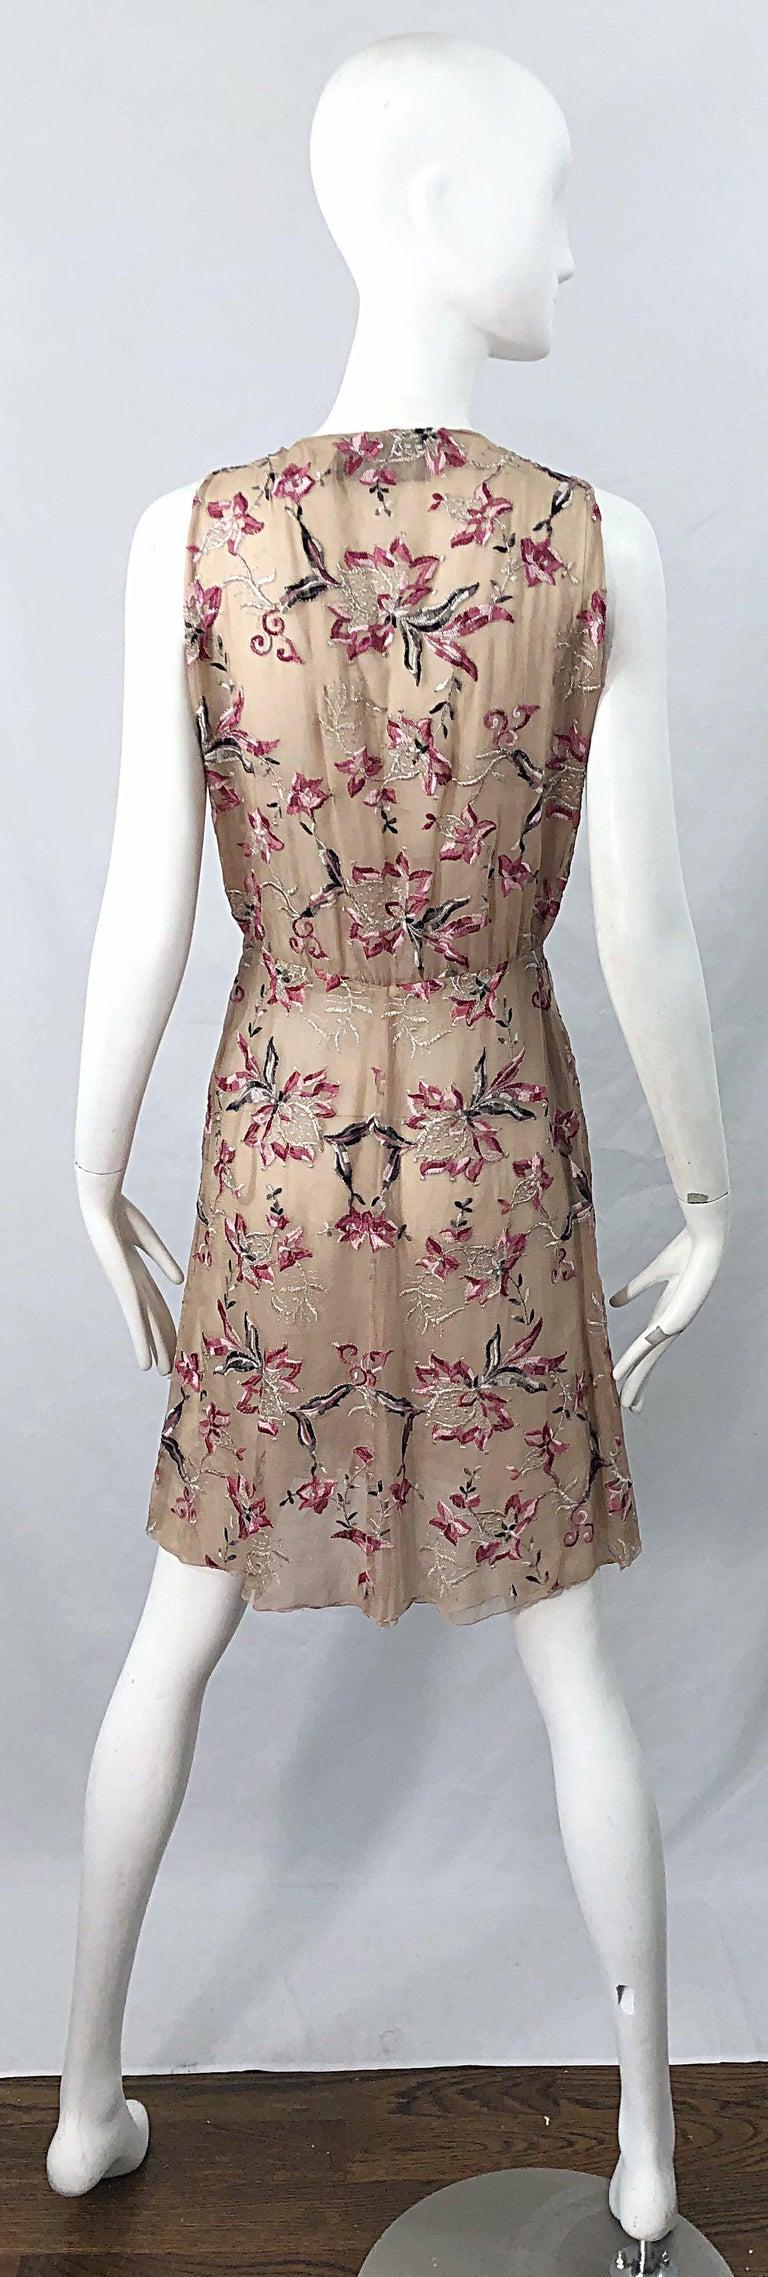 Beautiful 1990s Valentino Nude Silk Chiffon Semi Sheer Size 6 Embroidered Dress For Sale 9